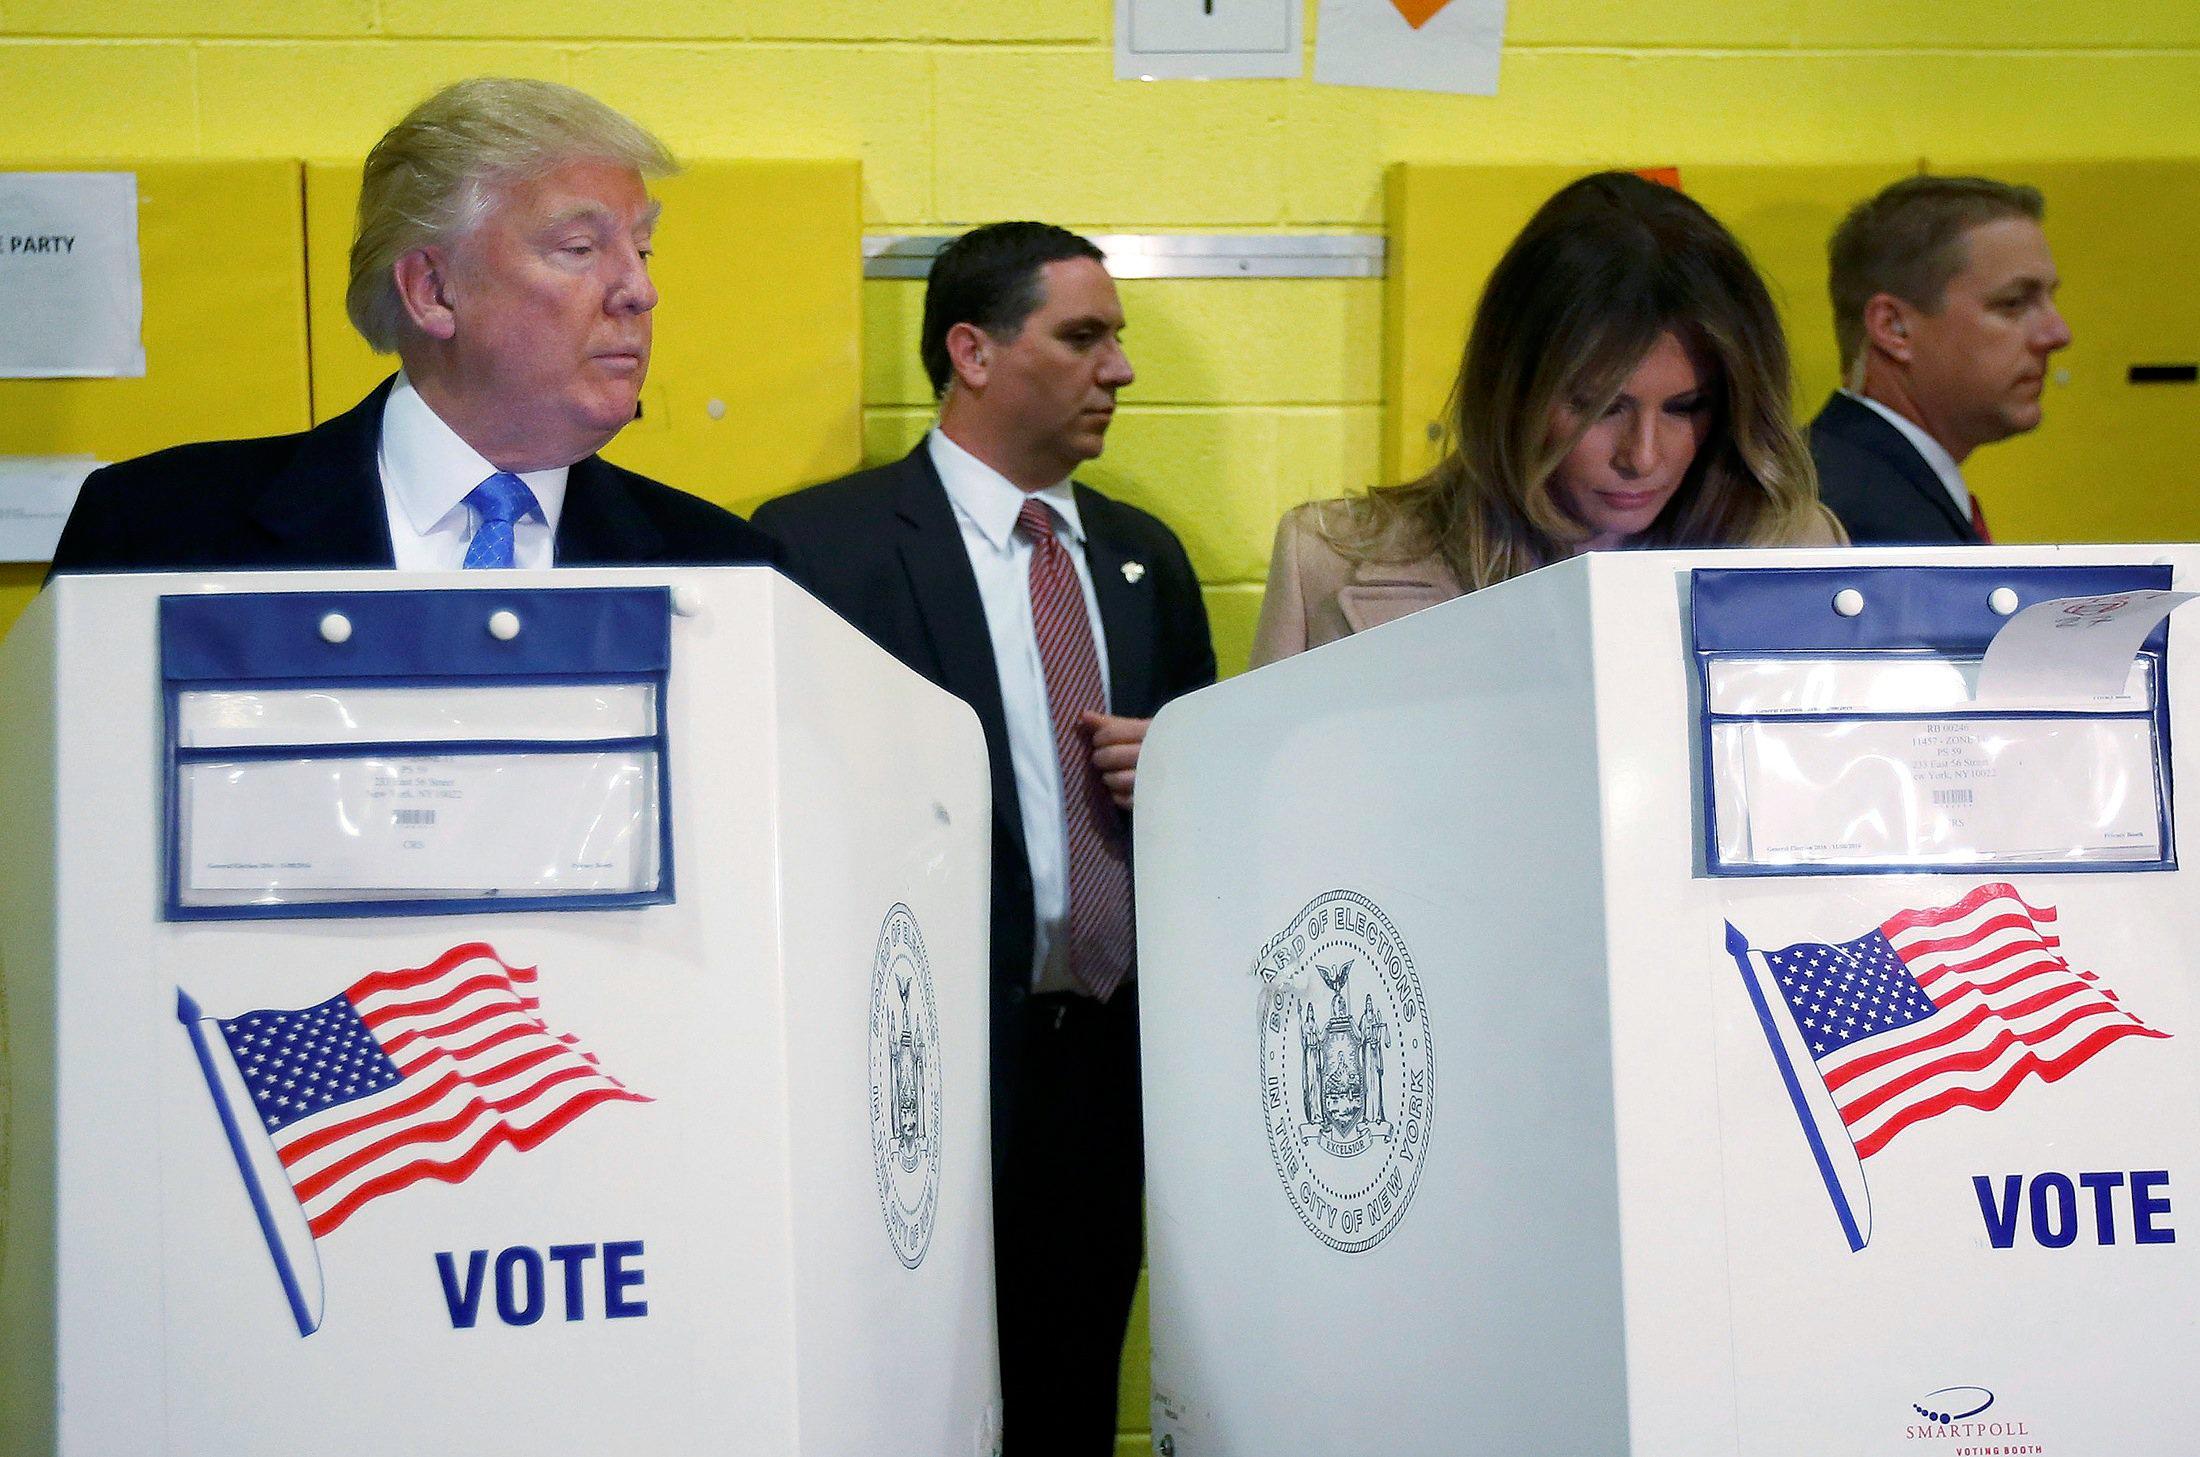 Republican presidential nominee Donald Trump and his wife Melania Trump vote at PS 59 in New York, New York, U.S. November 8, 2016.   REUTERS/Carlo Allegri